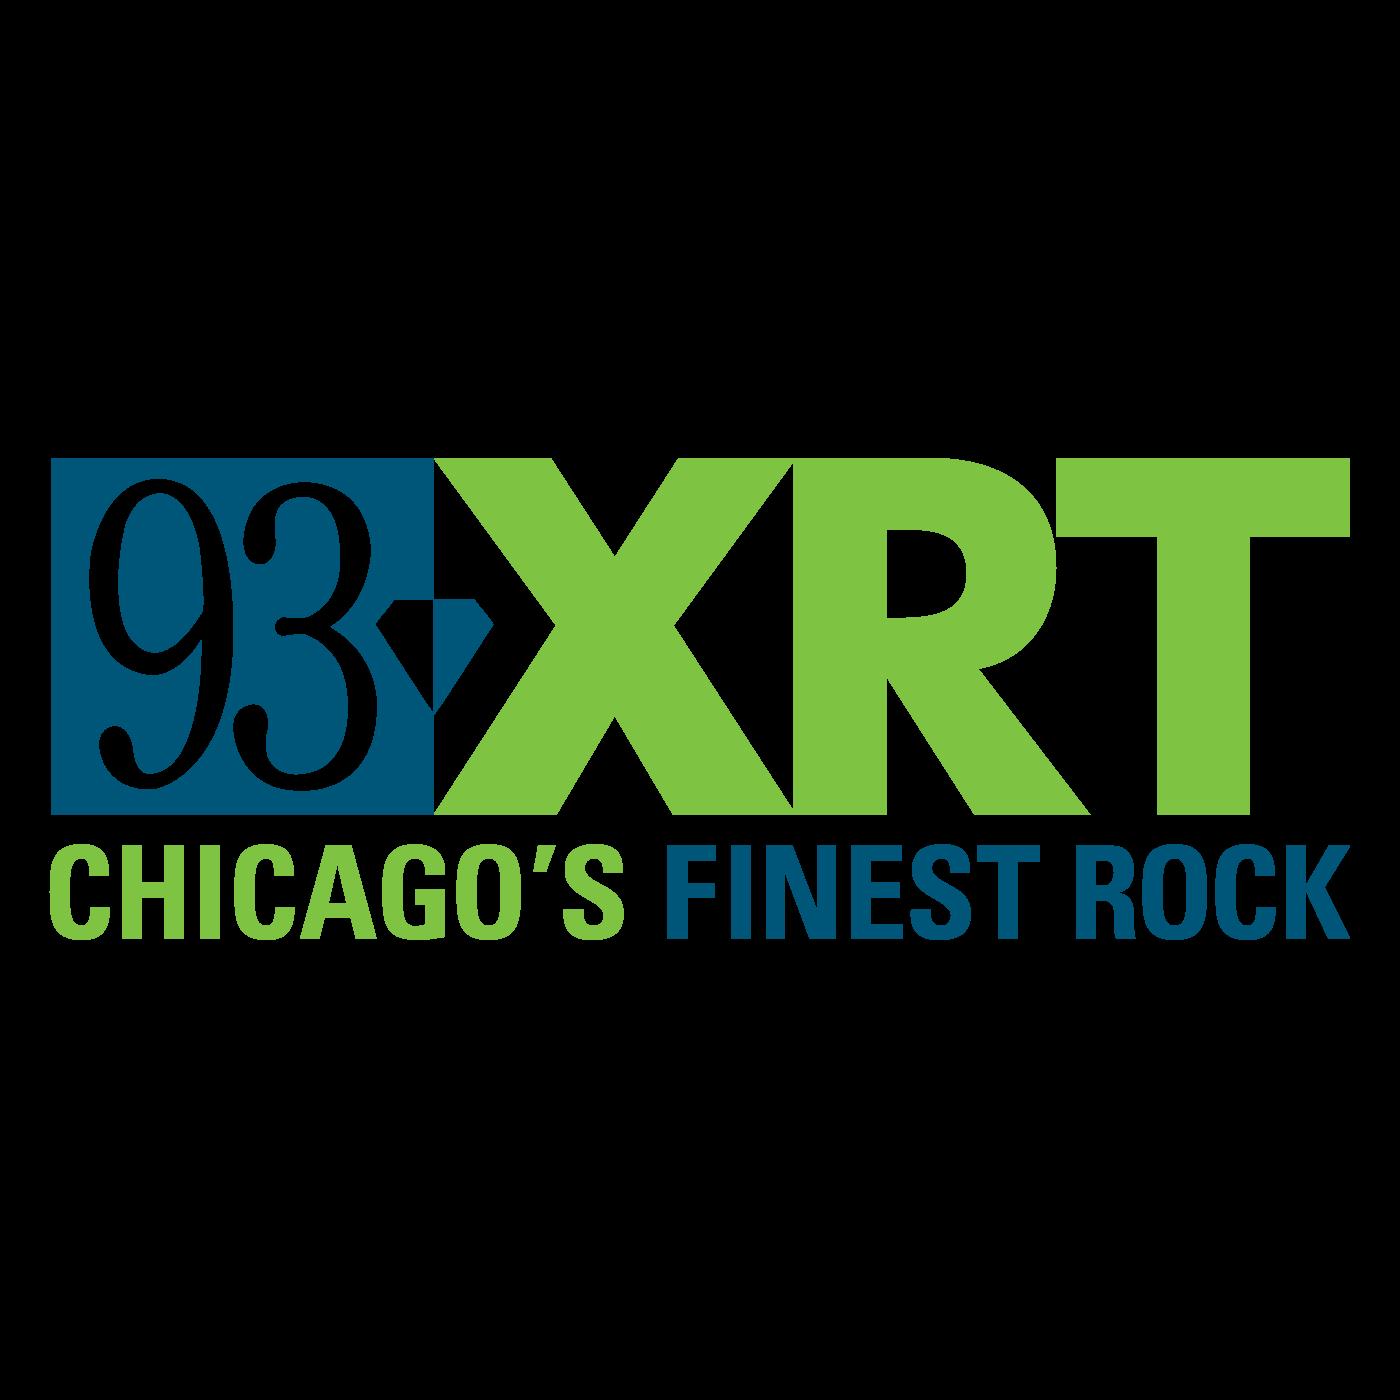 Radio com: Listen to Free Radio Online | Music, Sports, News, Podcasts